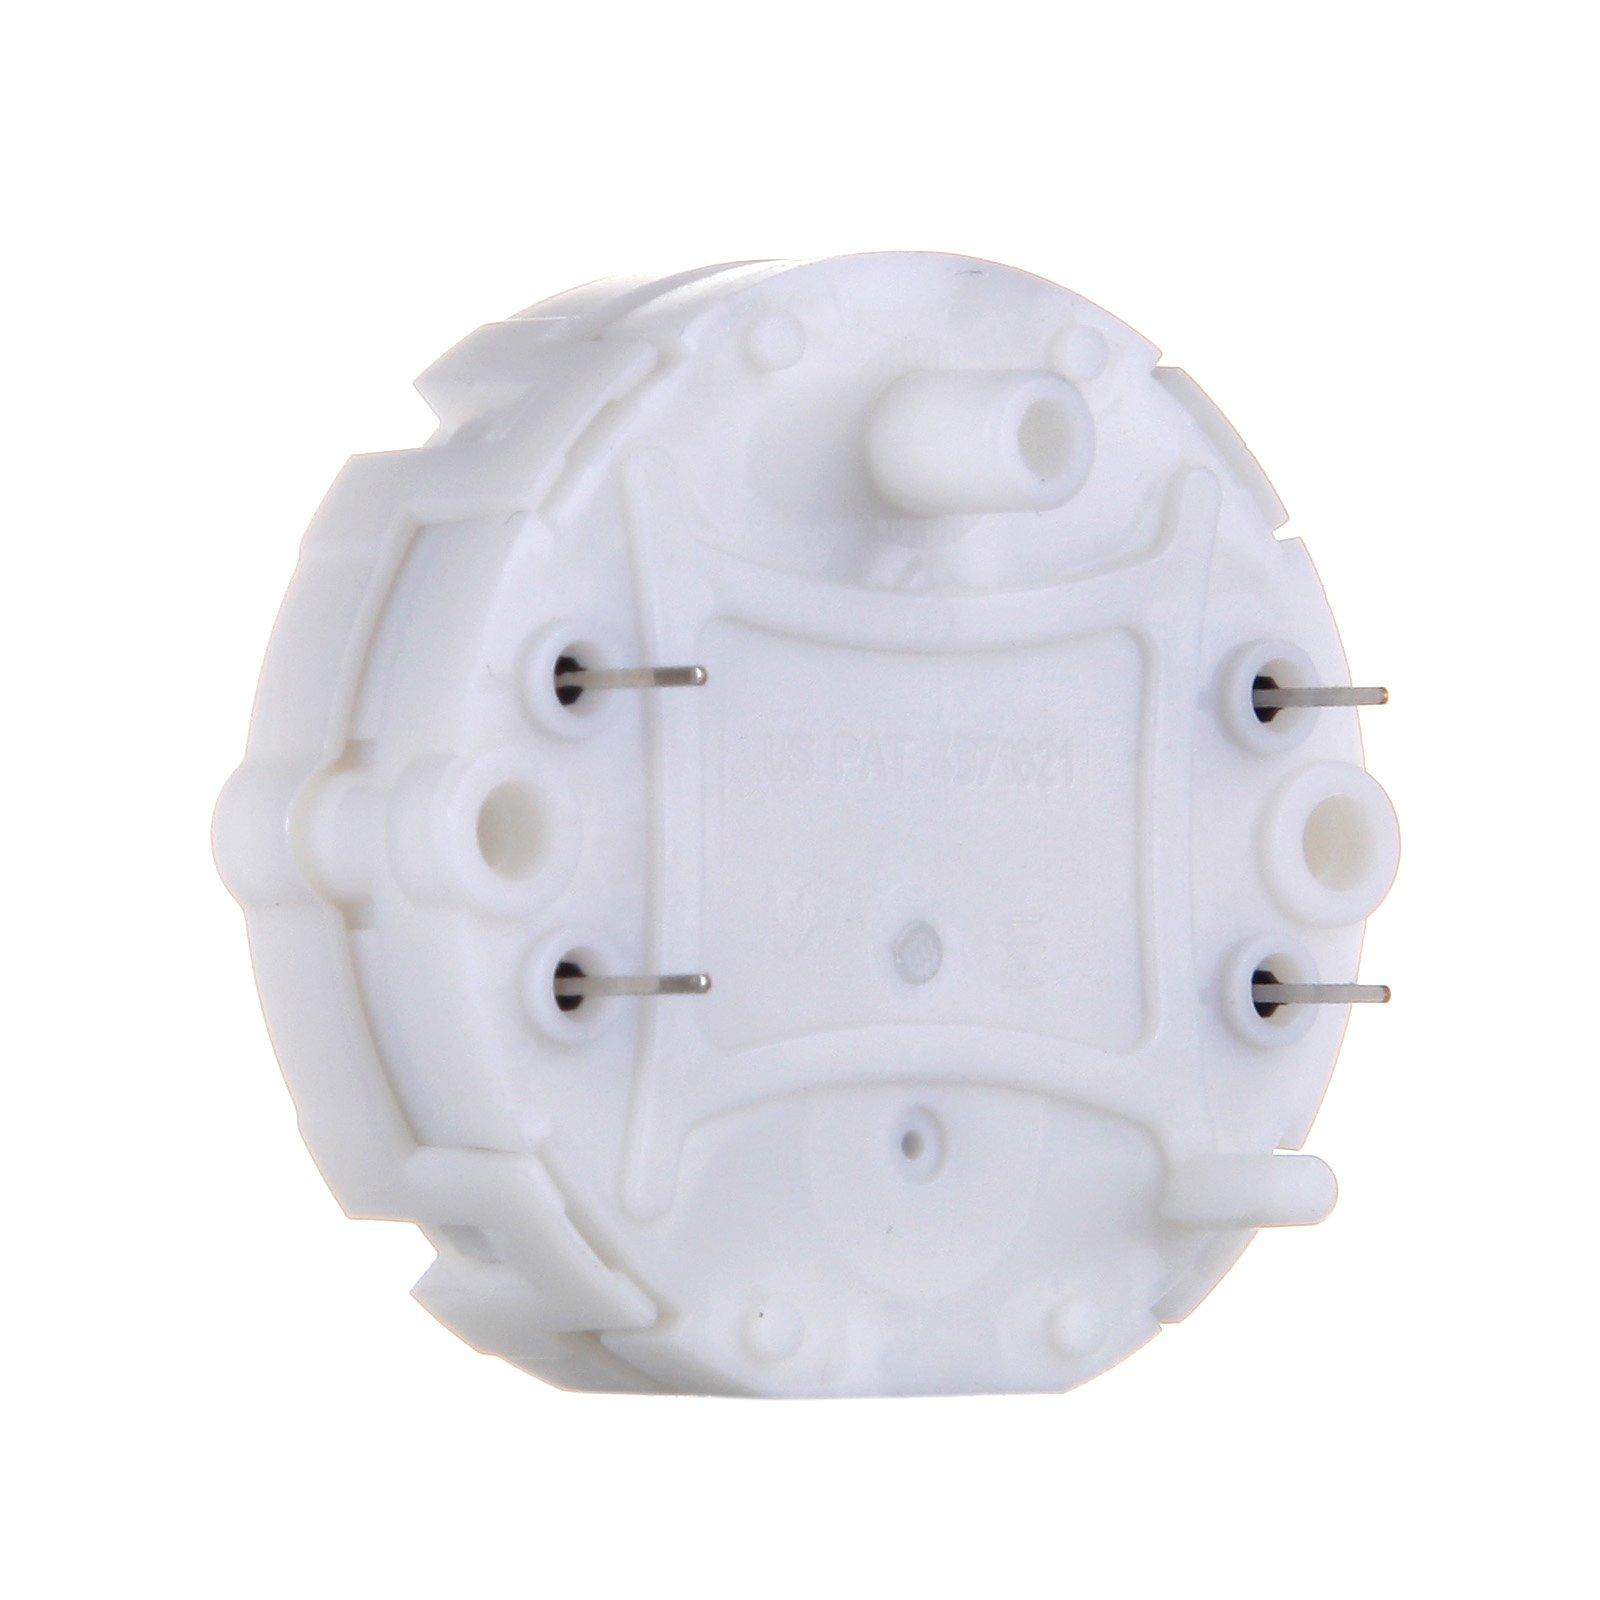 ECCPP X27.168 Stepper Motors Instrument Speedometer Gauge Cluster Repair Kit (6Pcs X27 168 Motor kit+10 Pack T5 Light) by ECCPP